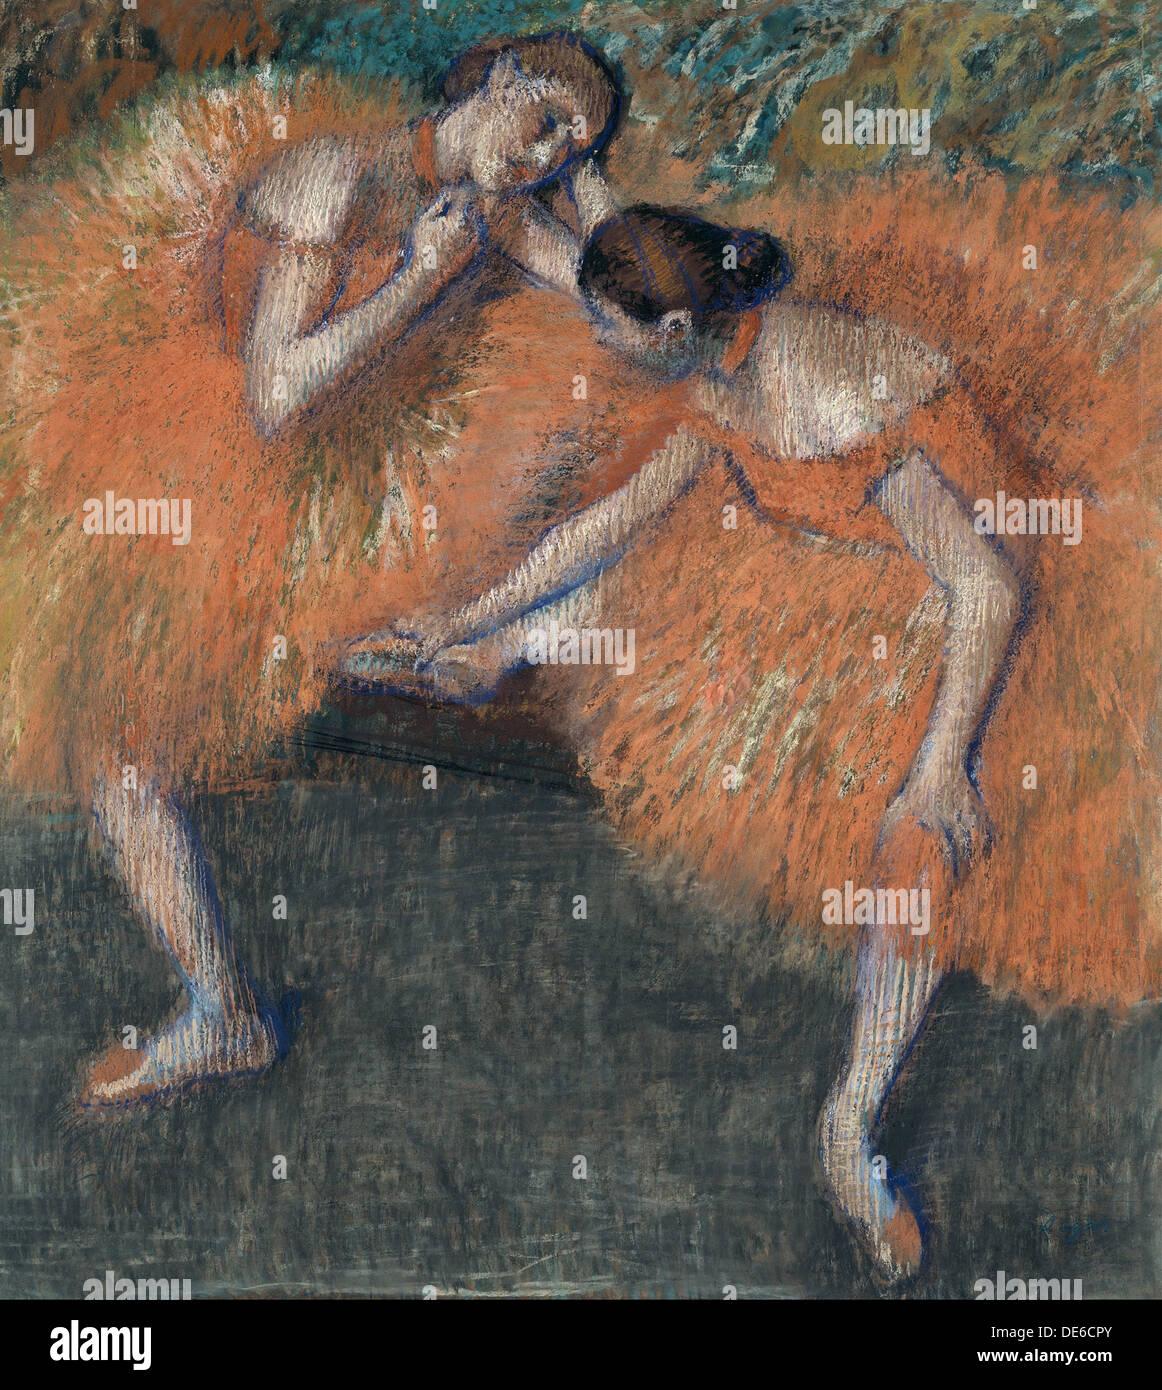 Two Dancers, c. 1898. Artist: Degas, Edgar (1834-1917) - Stock Image